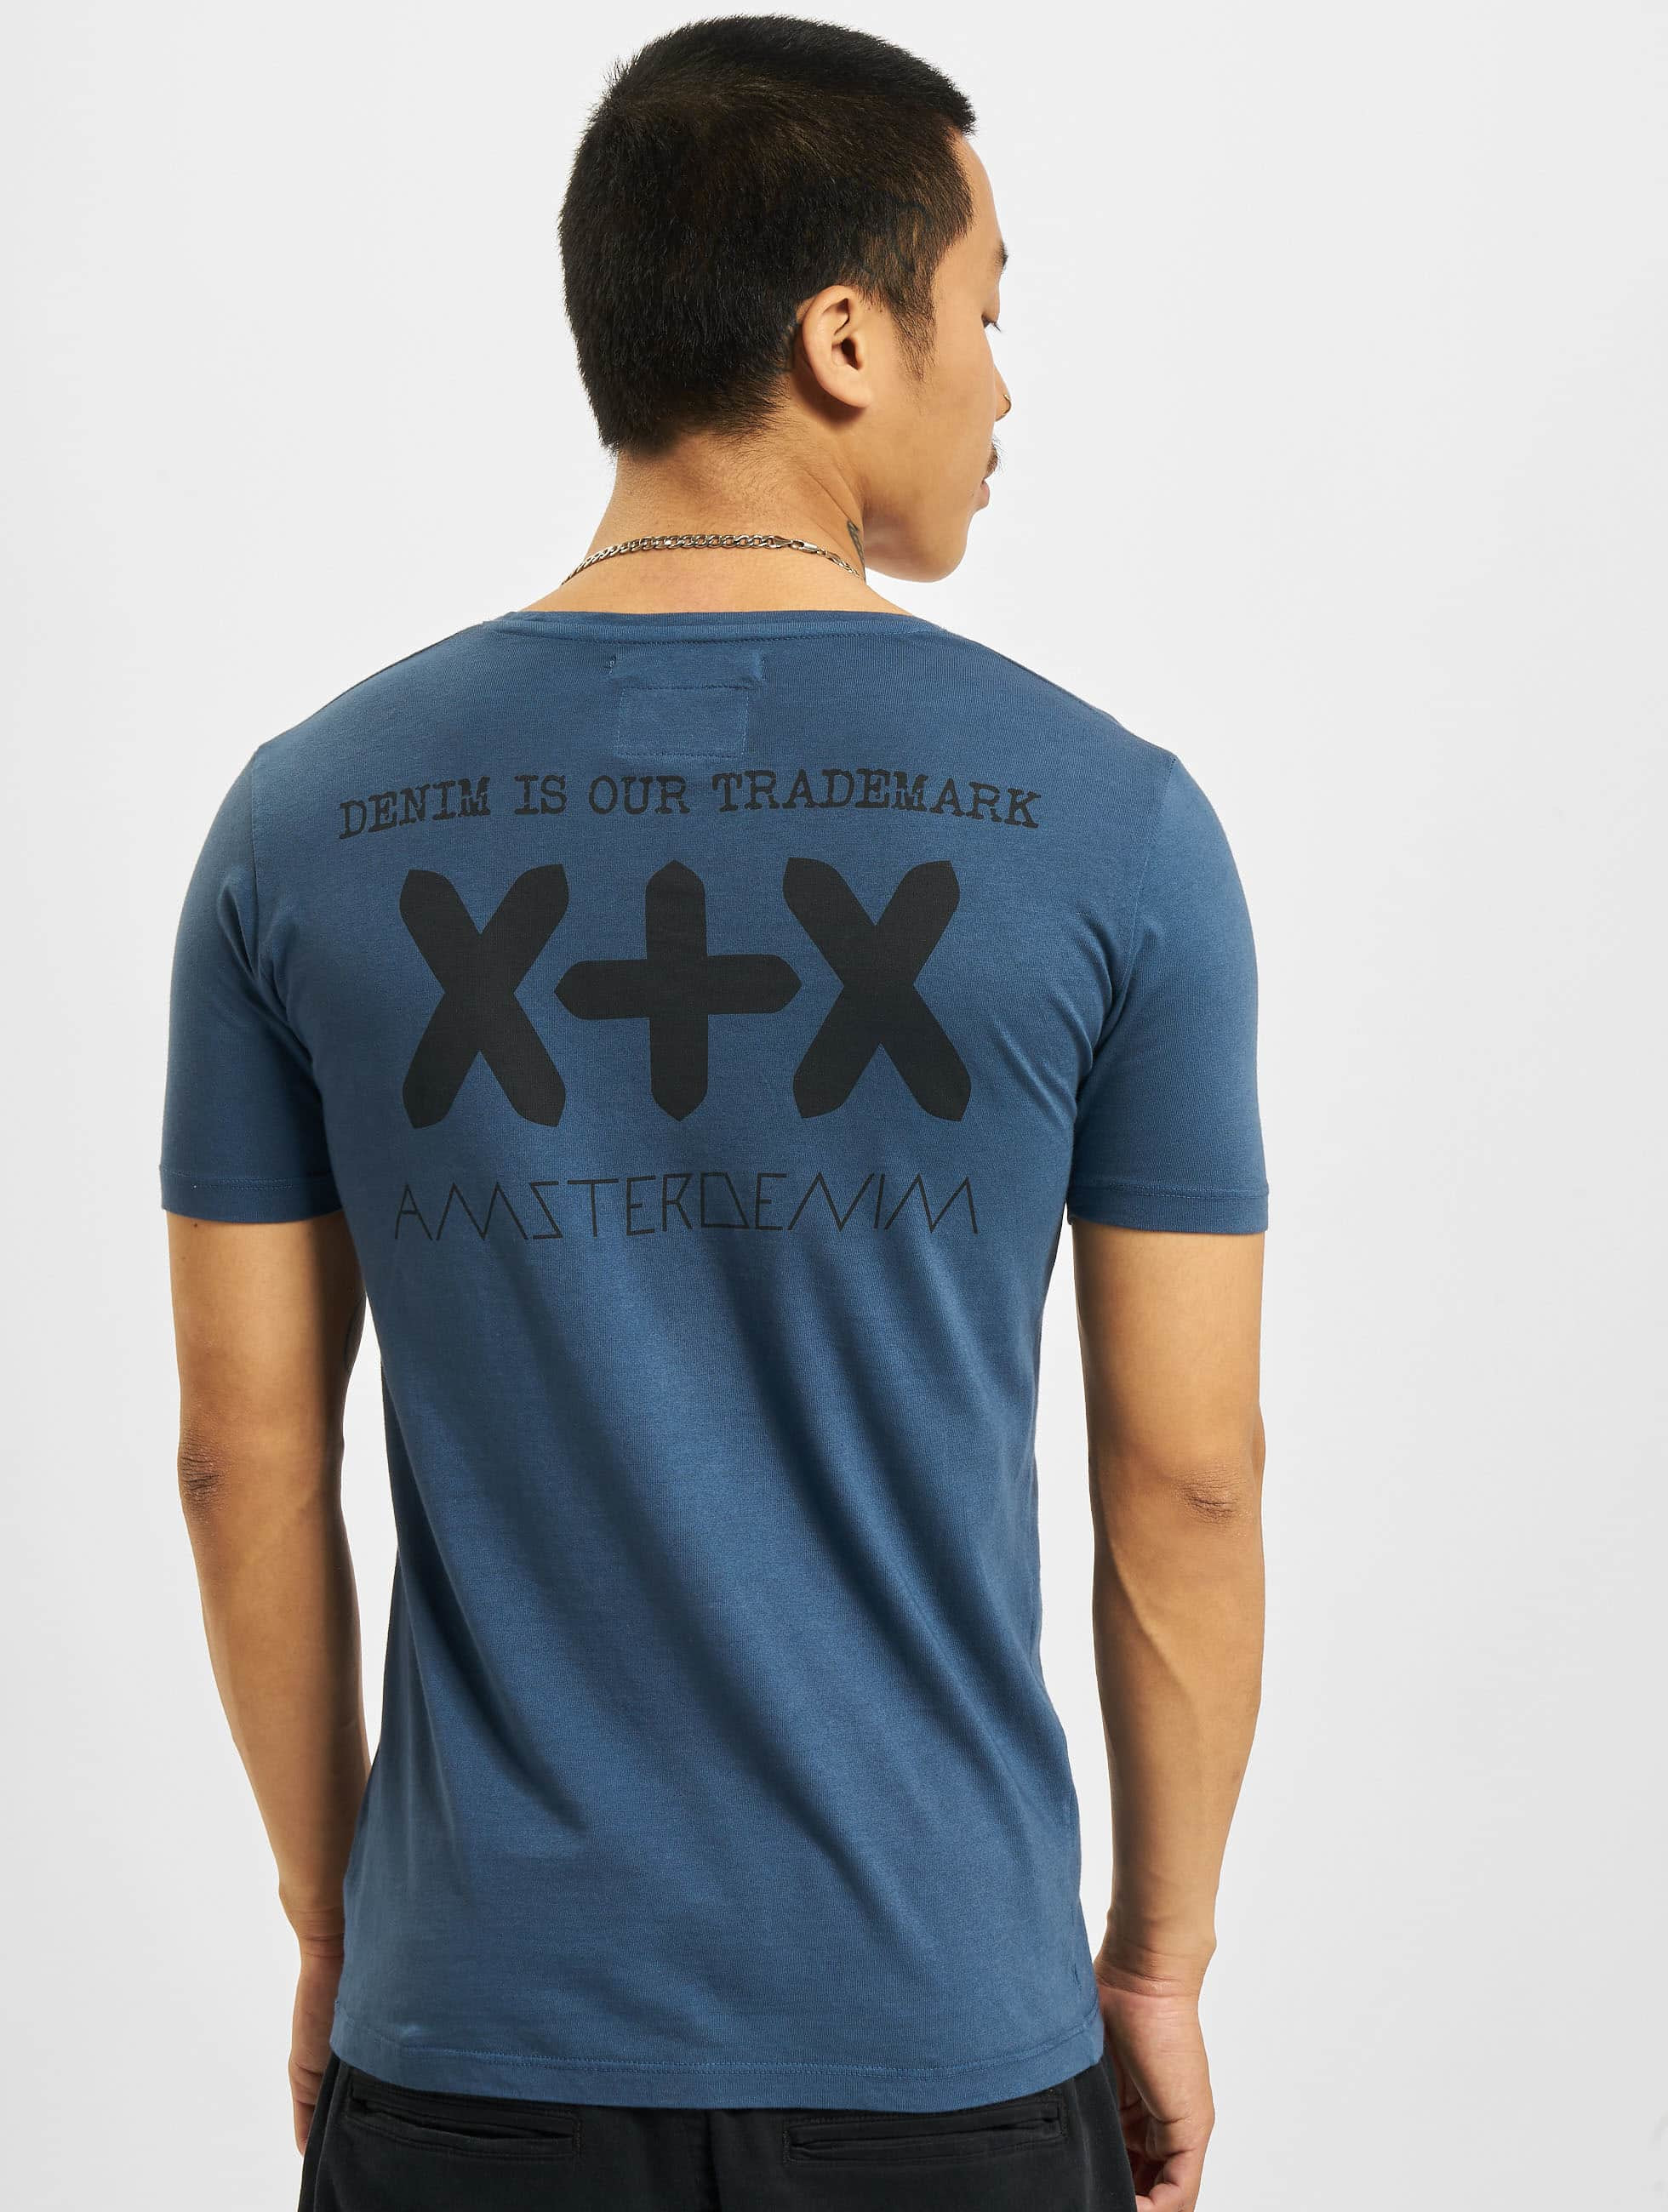 Amsterdenim t-shirt Vin blauw